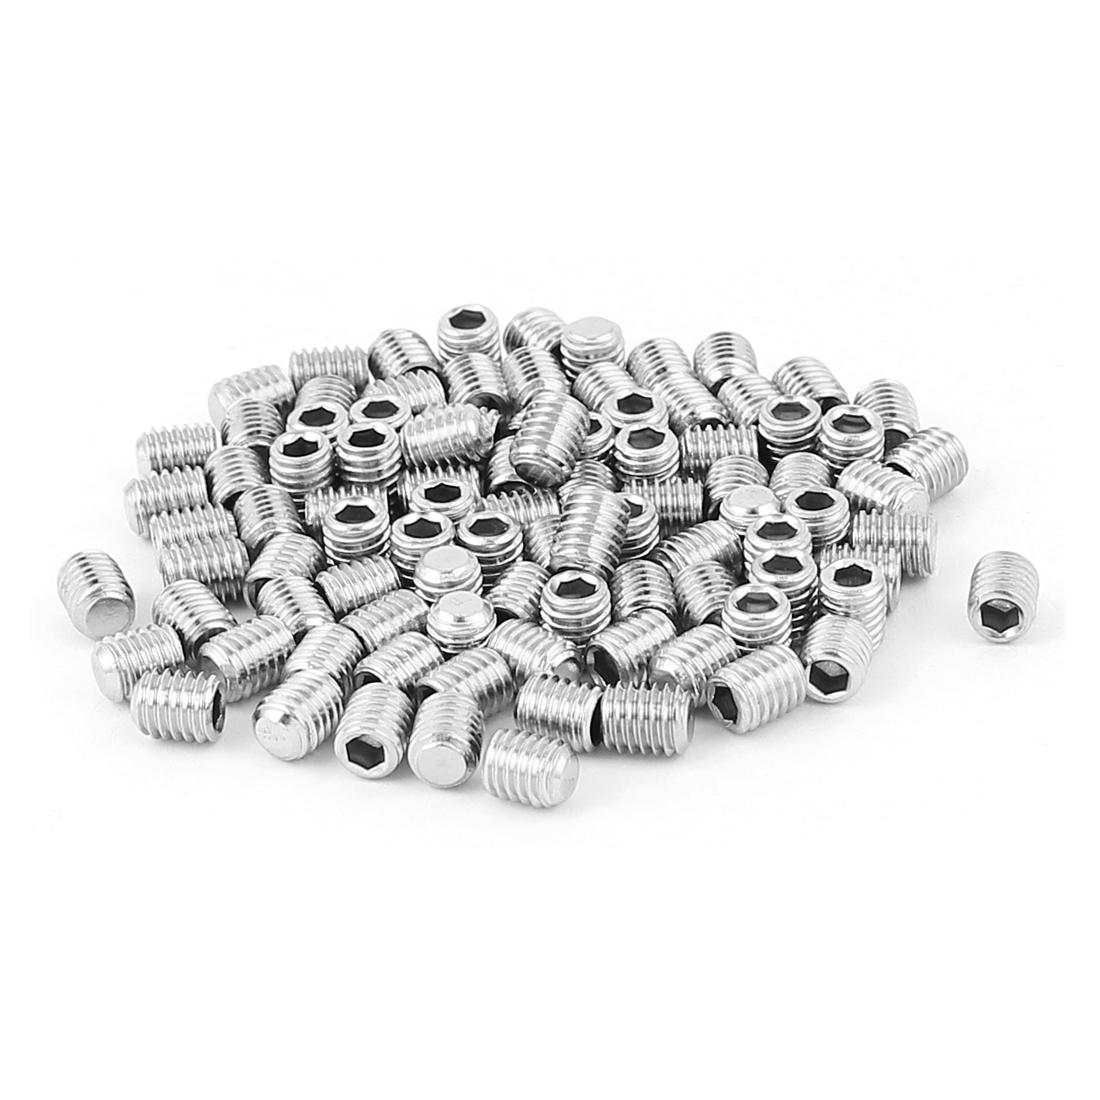 100pcs Stainless Steel M5x6mm Thread Hex Socket Flat Point Grub Screws